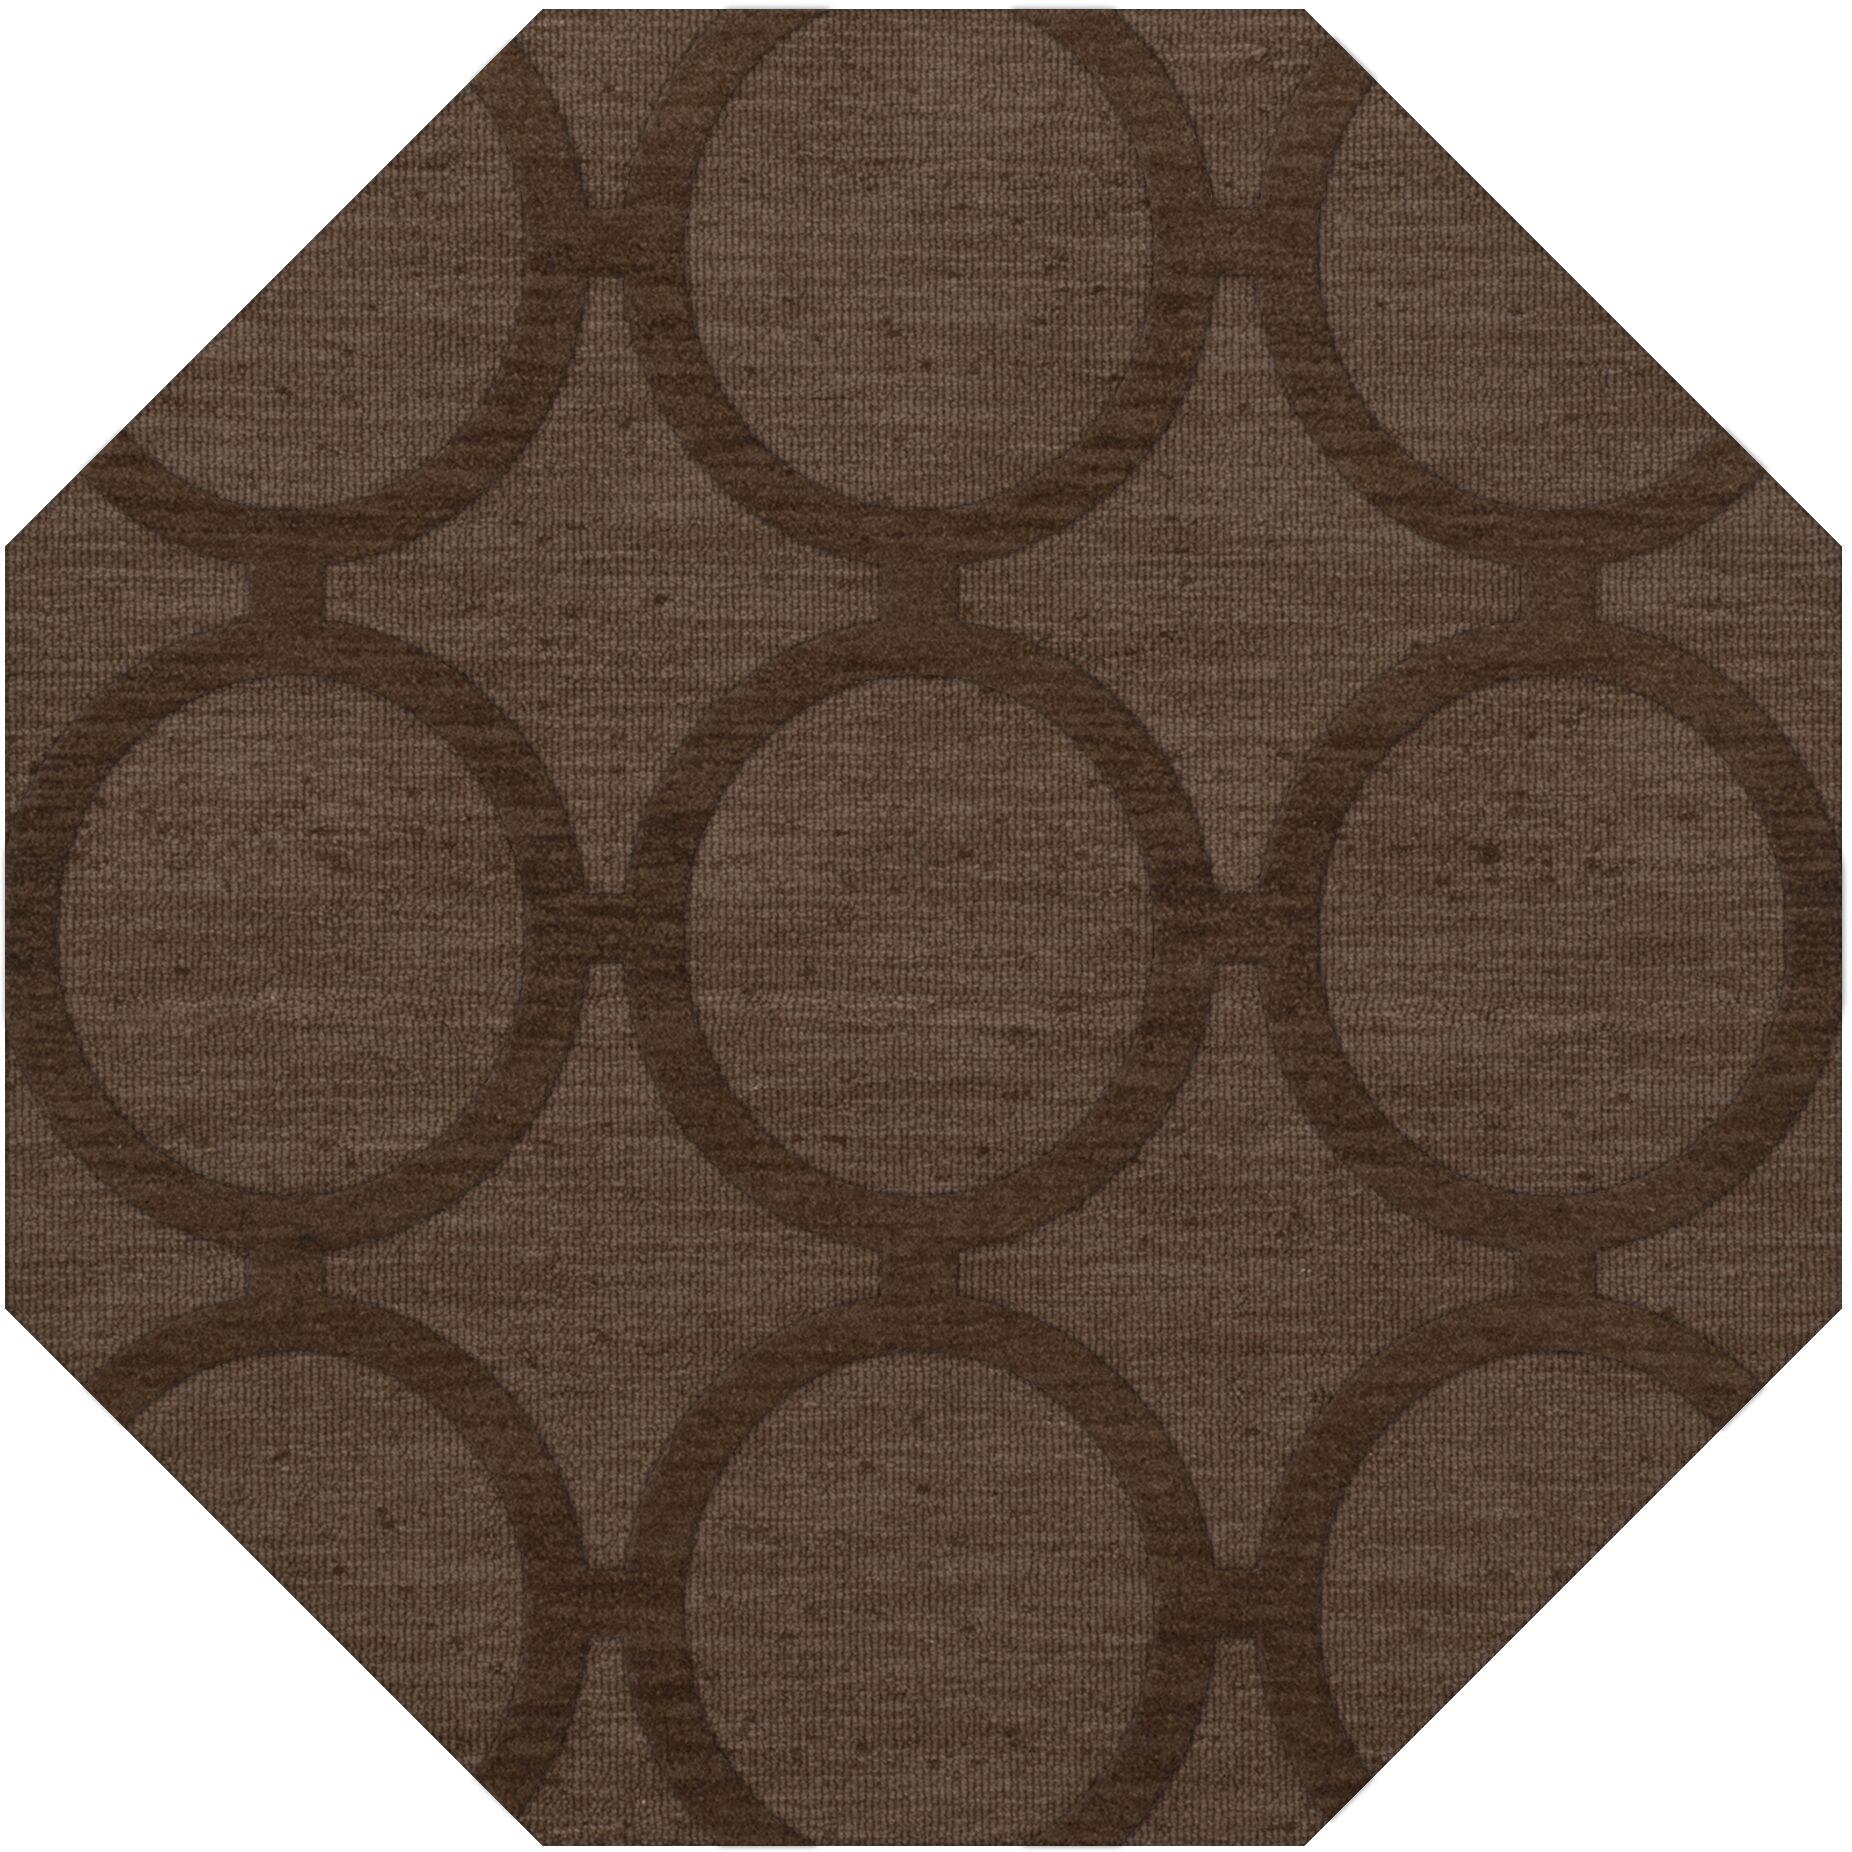 Dover Tufted Wool Mocha Area Rug Rug Size: Octagon 12'